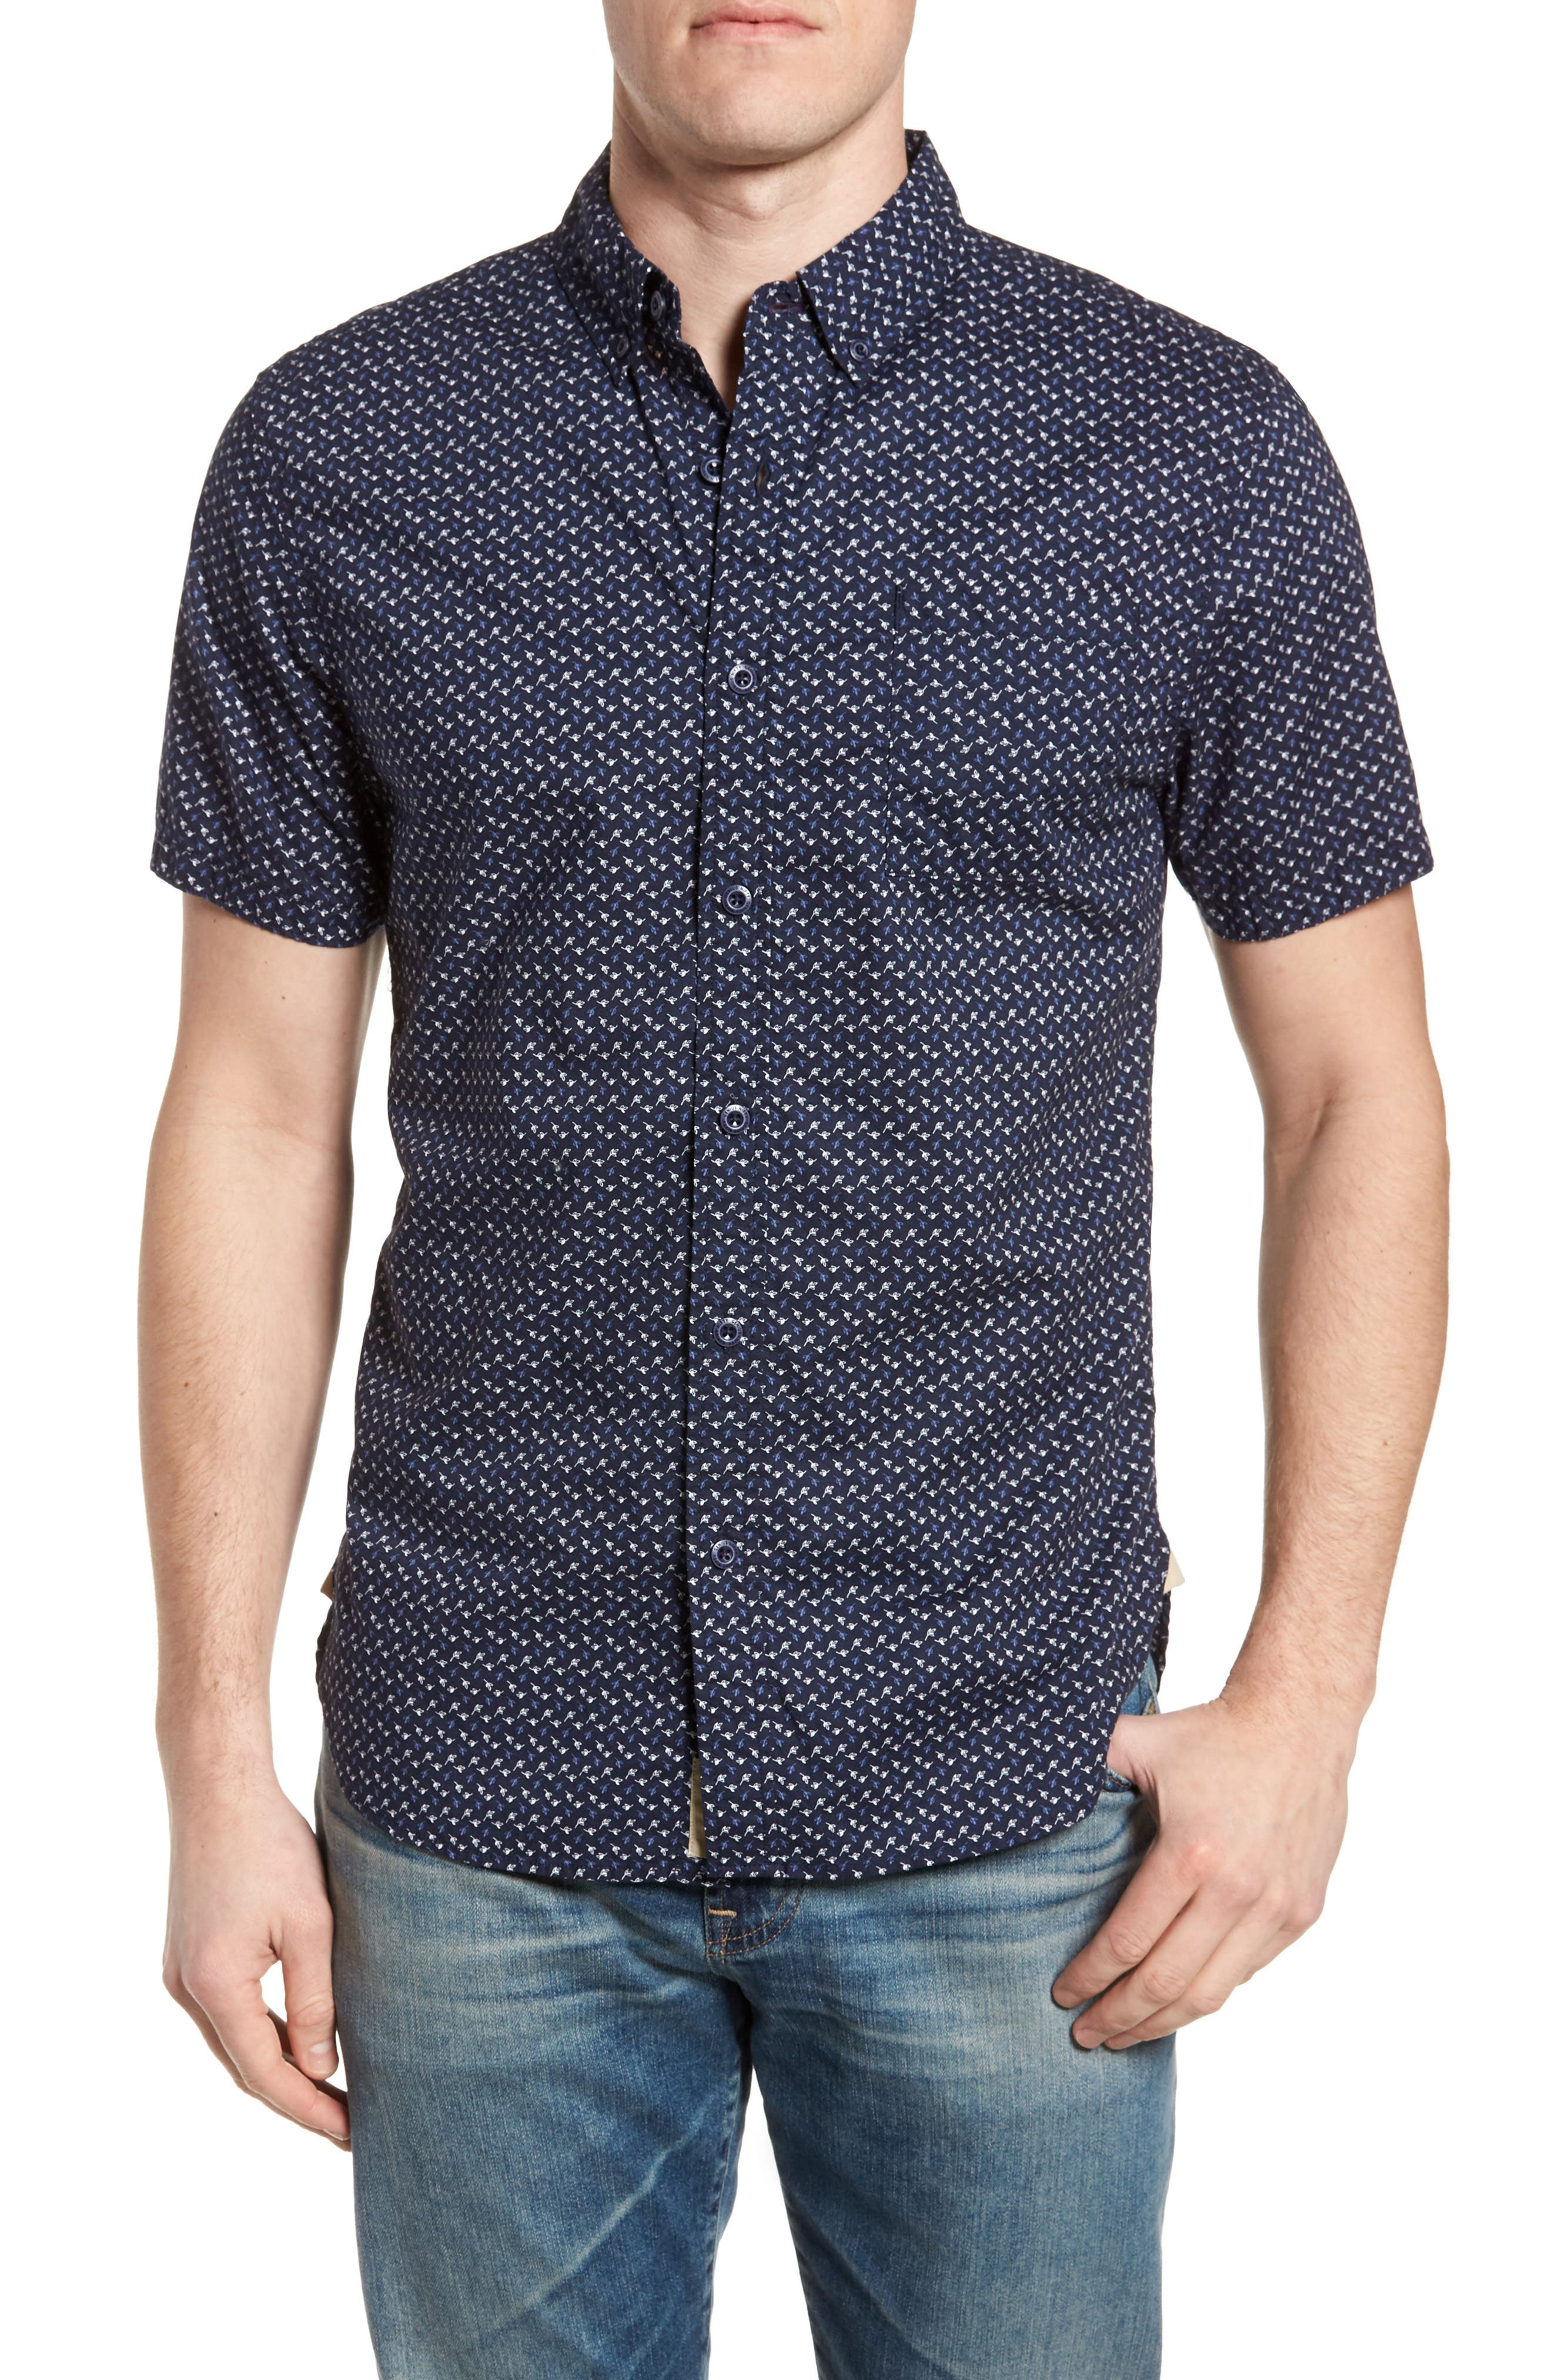 Truman Slim Fit Short Sleeve Sport Shirt,                             Main thumbnail 1, color,                             NAVY